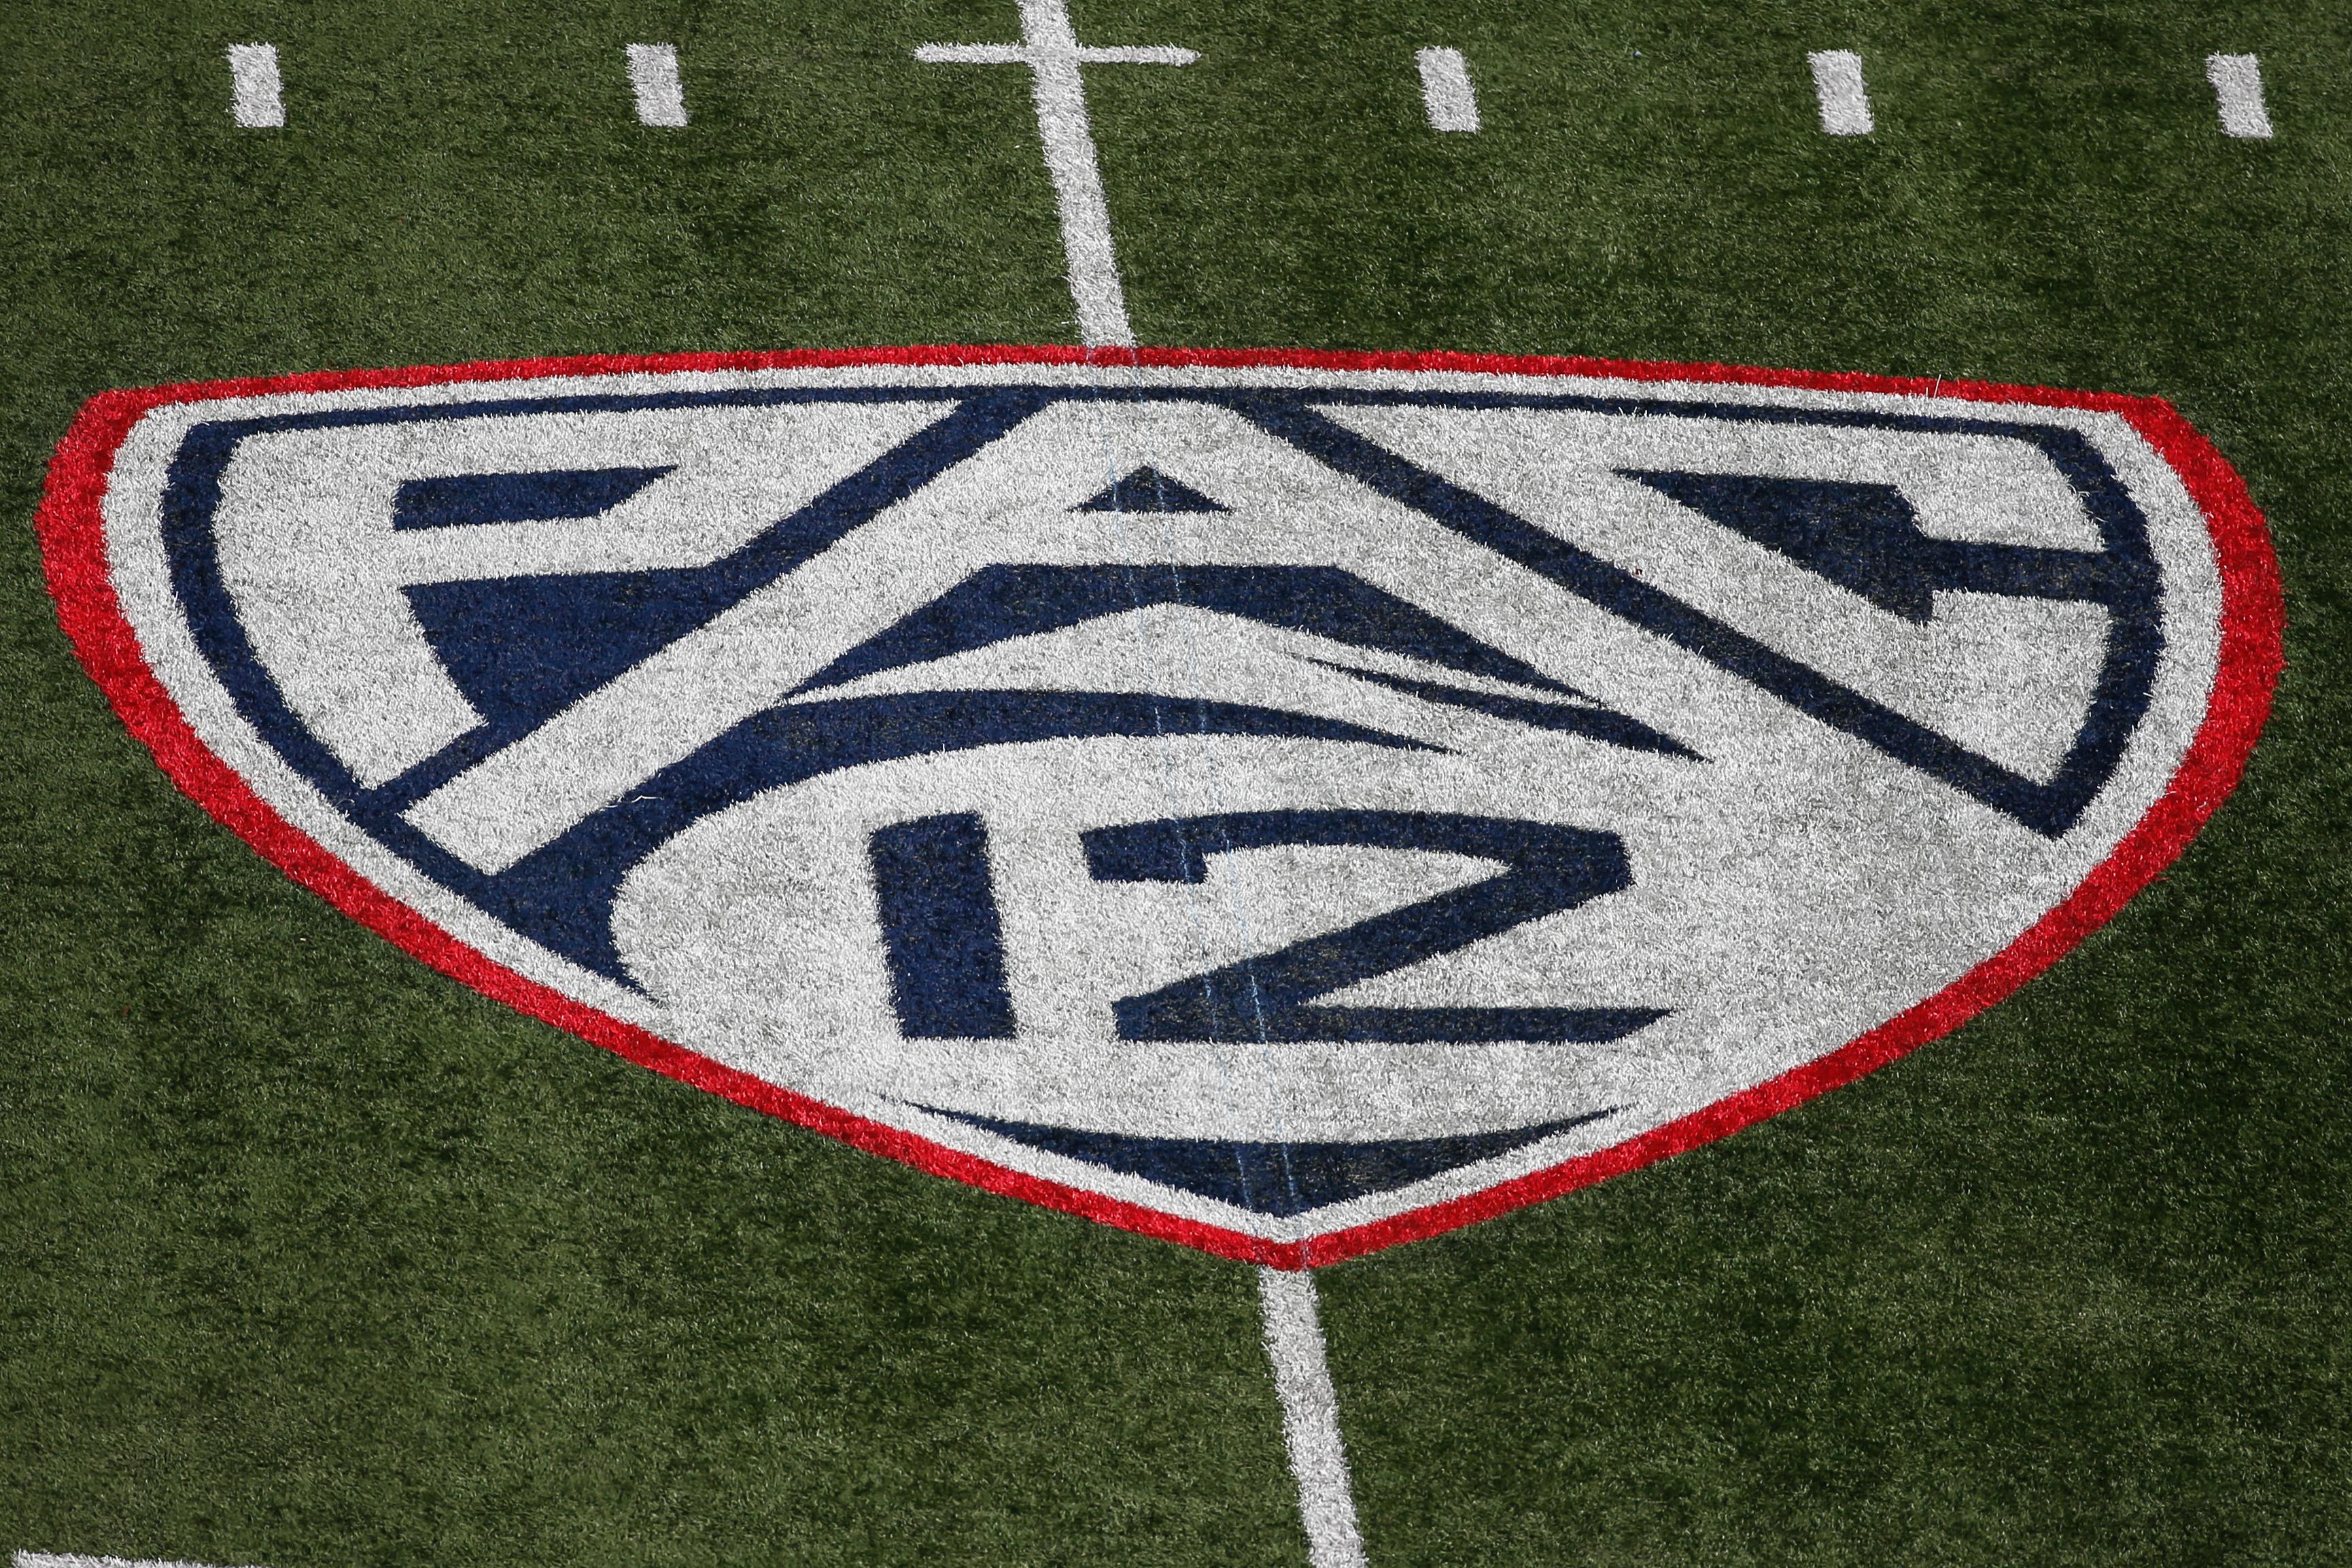 COLLEGE FOOTBALL: NOV 24 Arizona State at Arizona